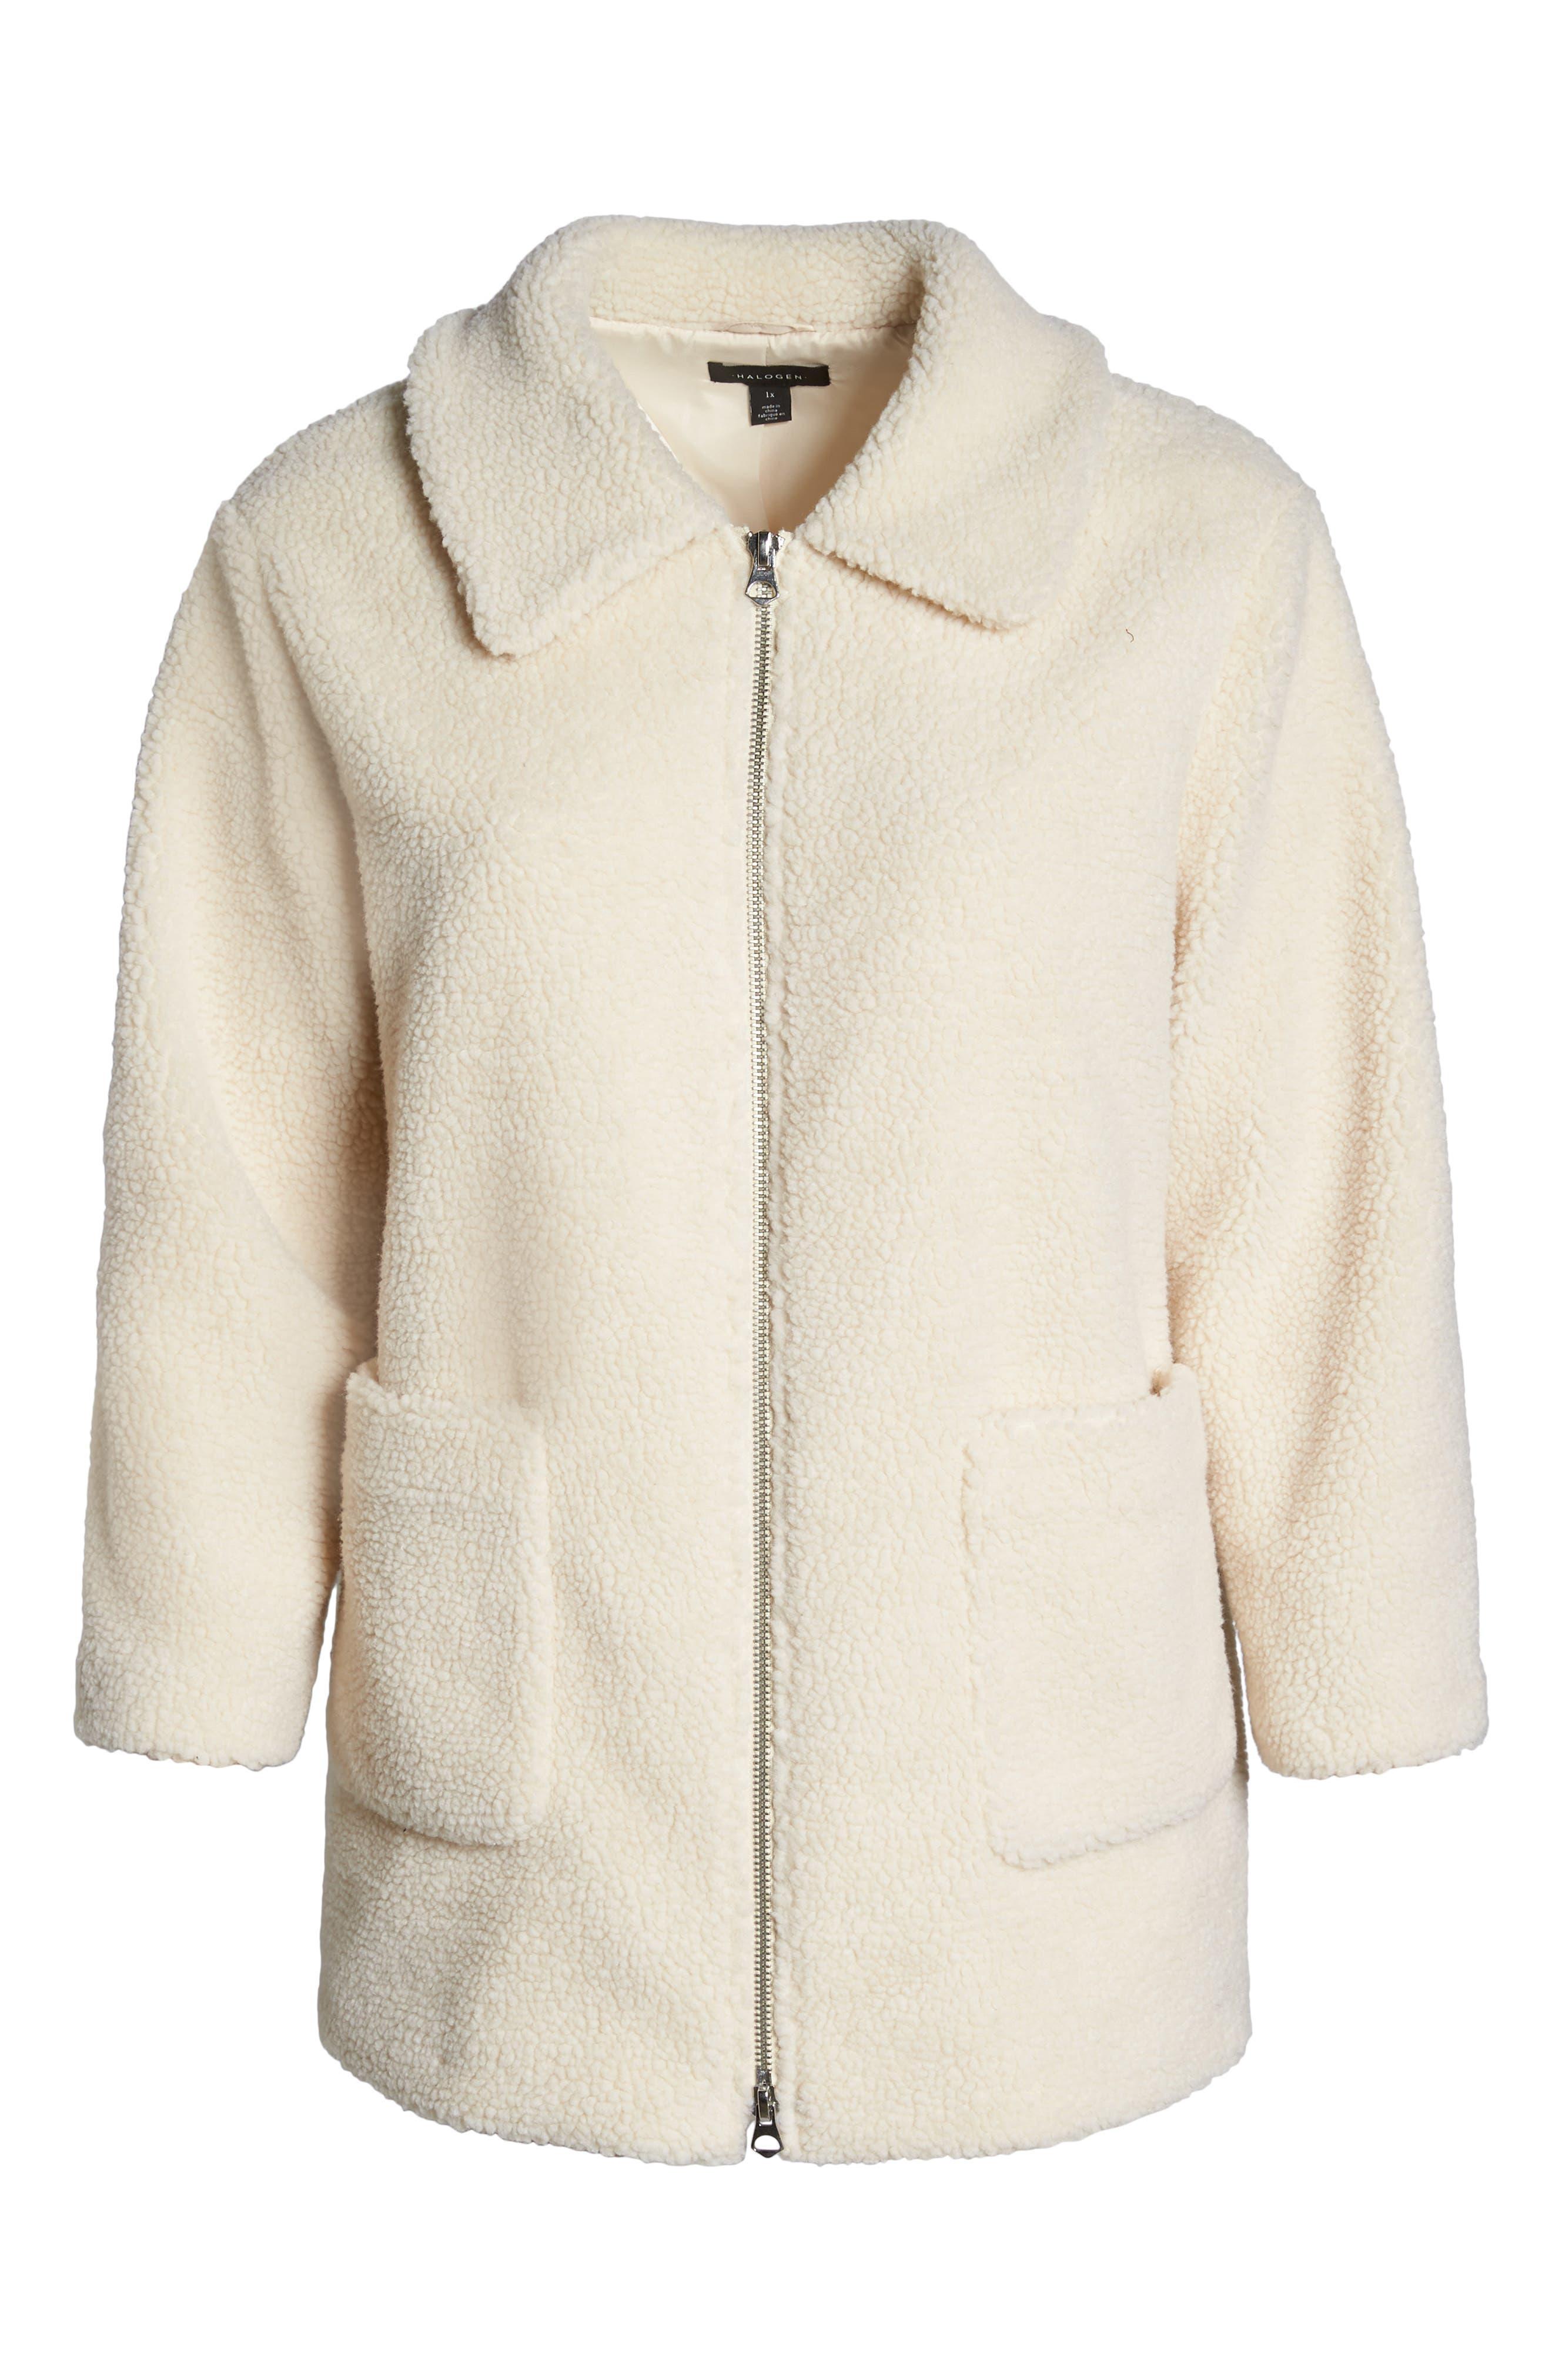 Zip Front Teddy Coat,                             Alternate thumbnail 6, color,                             IVORY